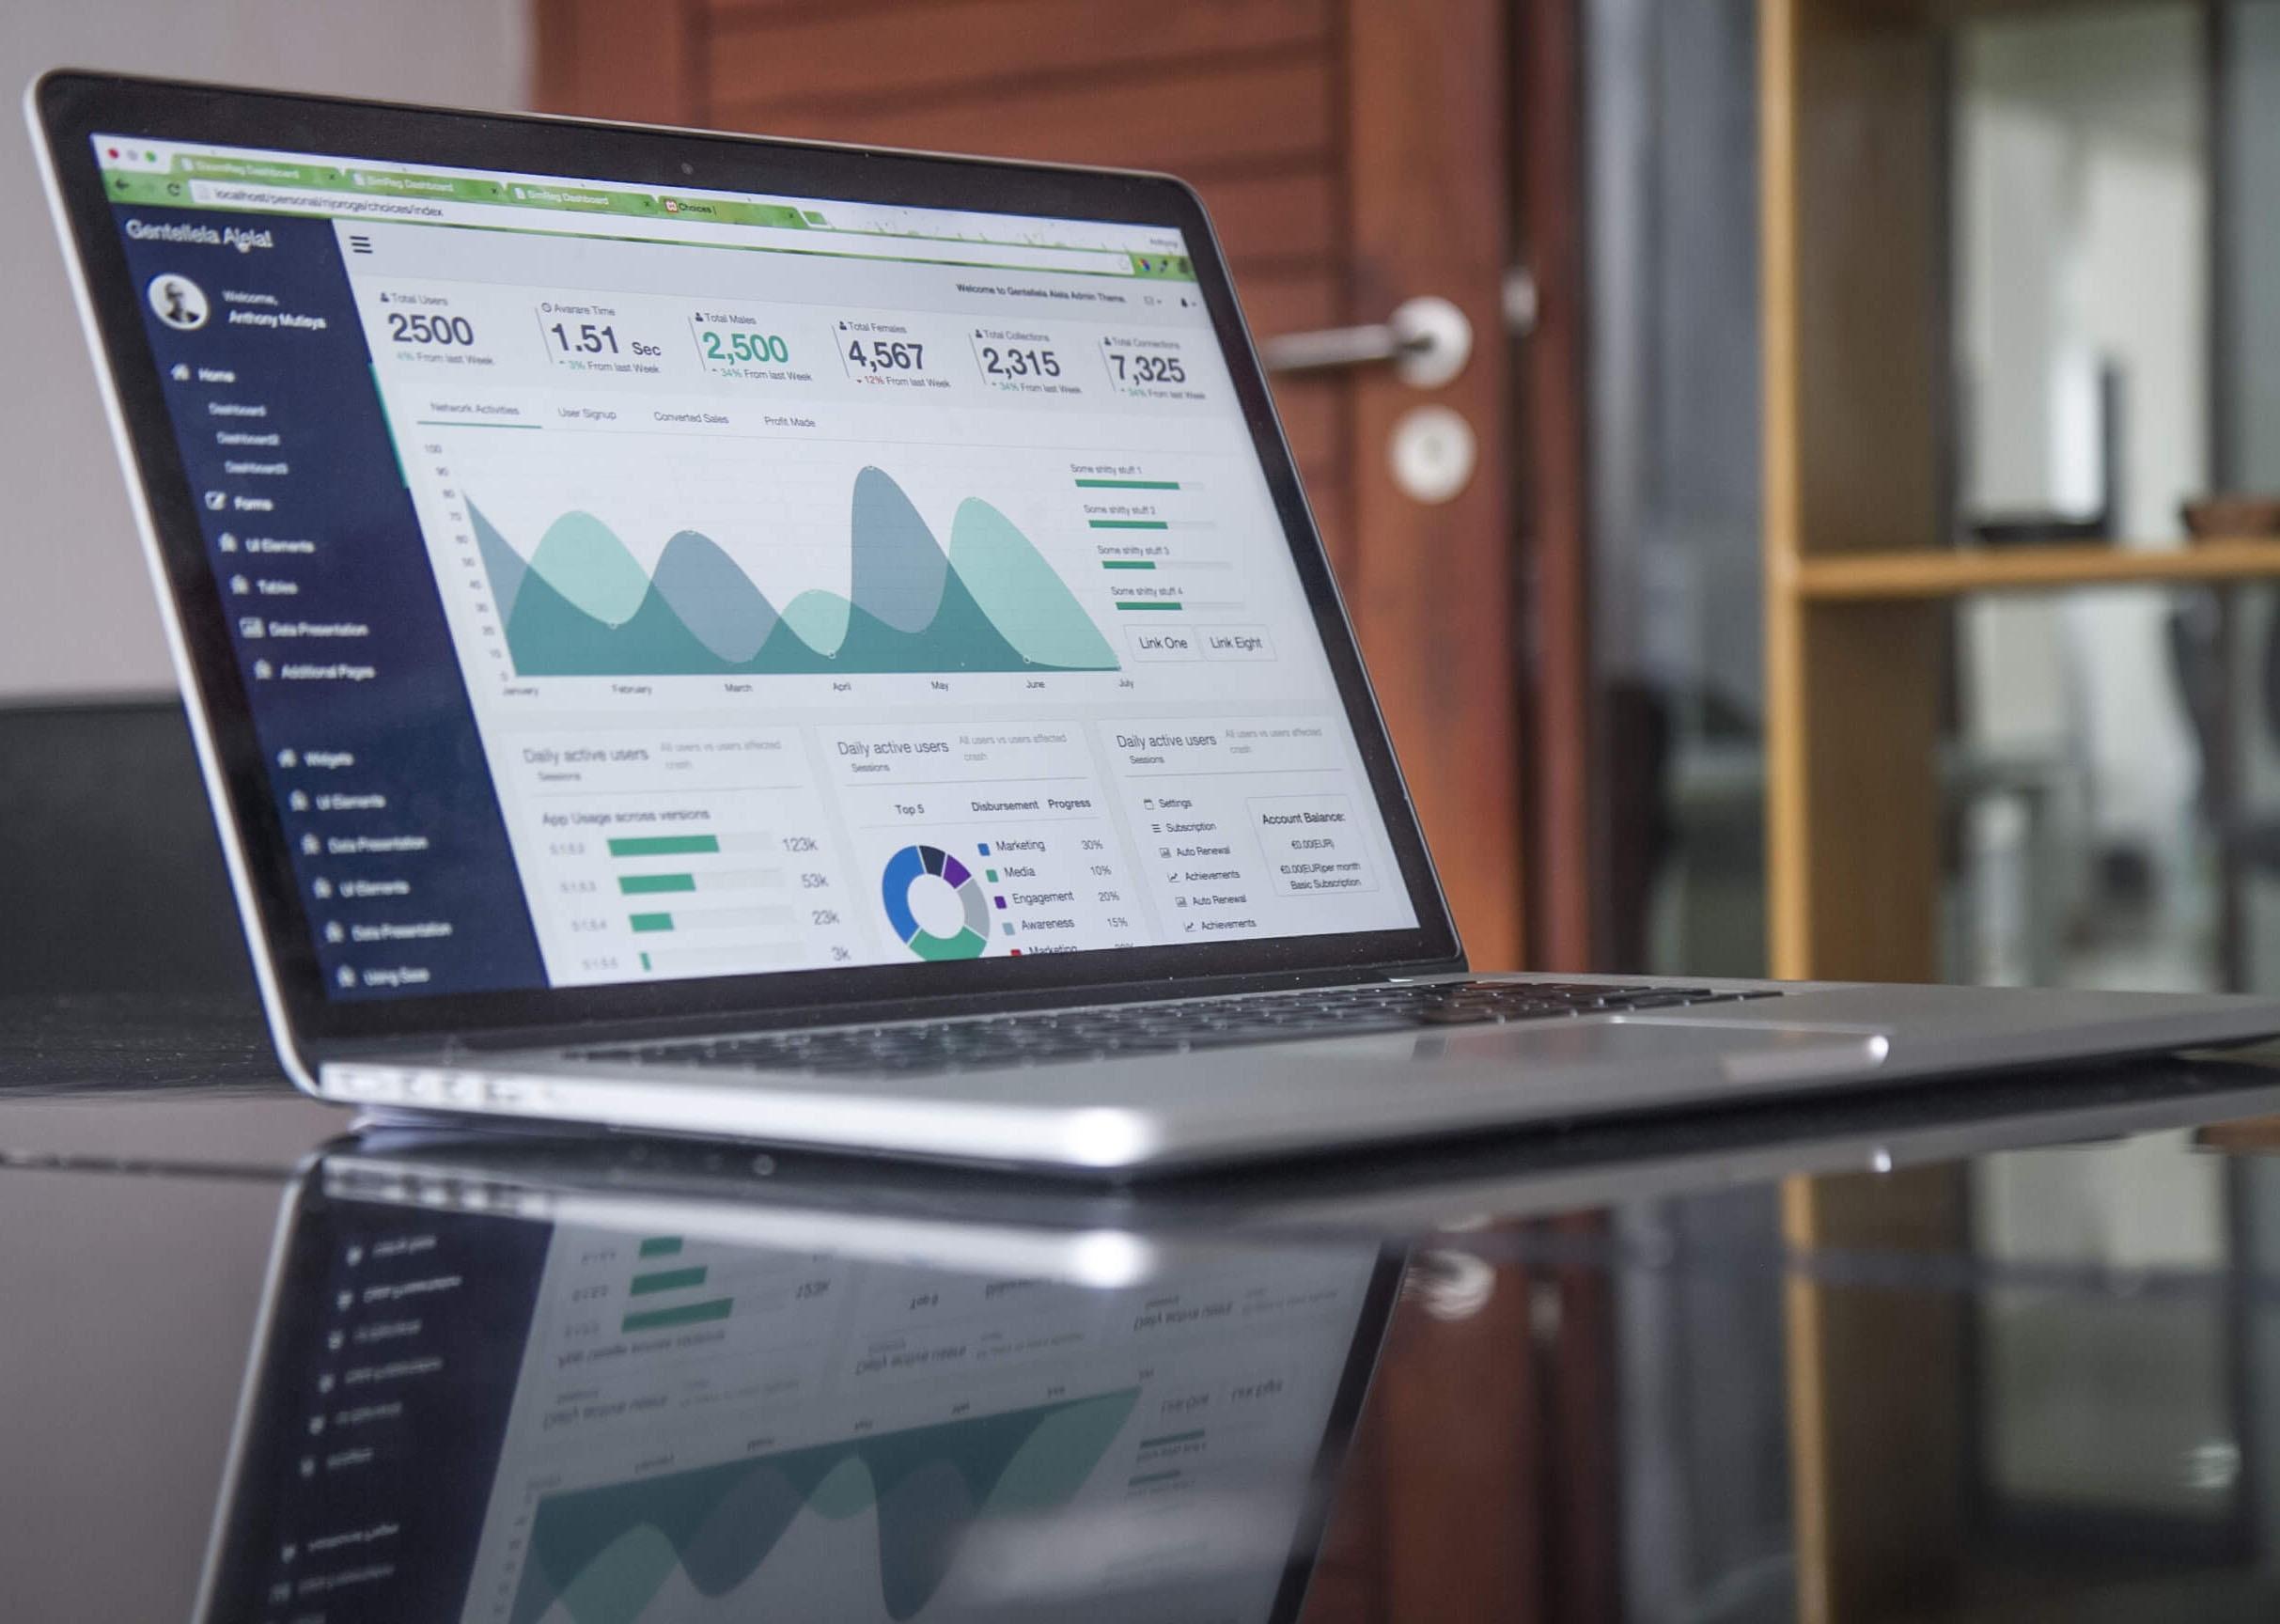 Onderzoek en toolkit stimuleren MKB'ers om aan de slag te gaan met Digital Marketing